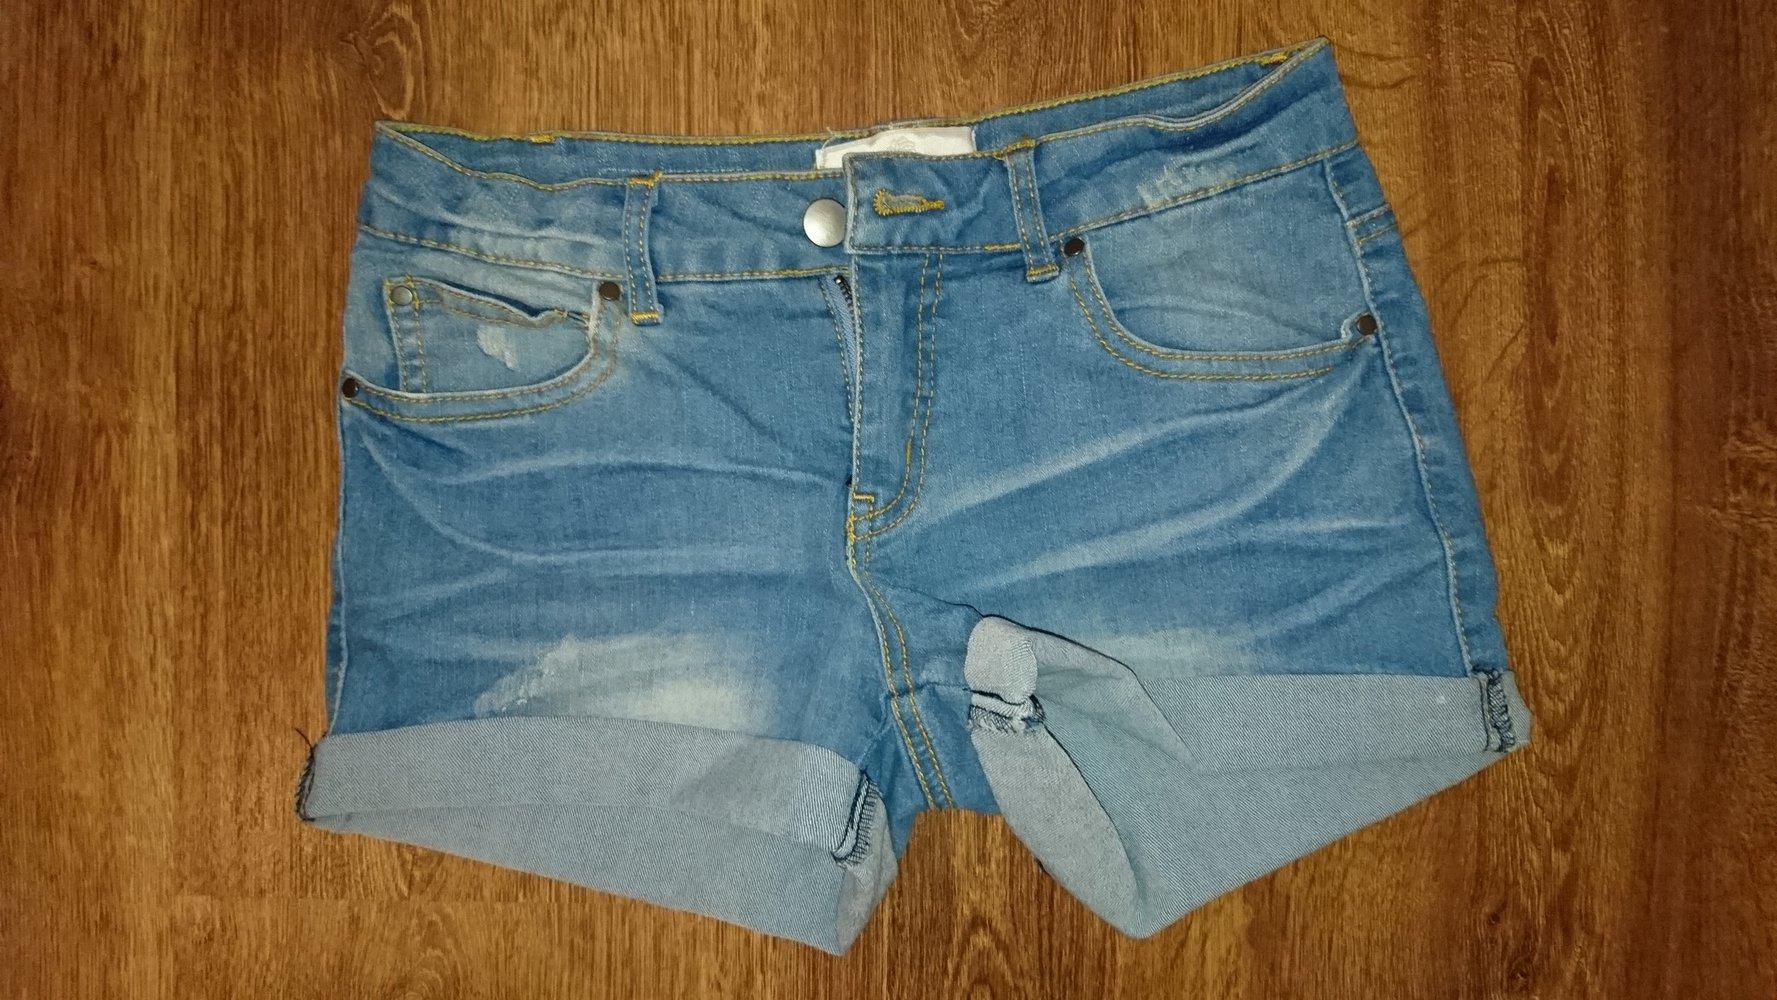 pieces schicke jeans shorts. Black Bedroom Furniture Sets. Home Design Ideas